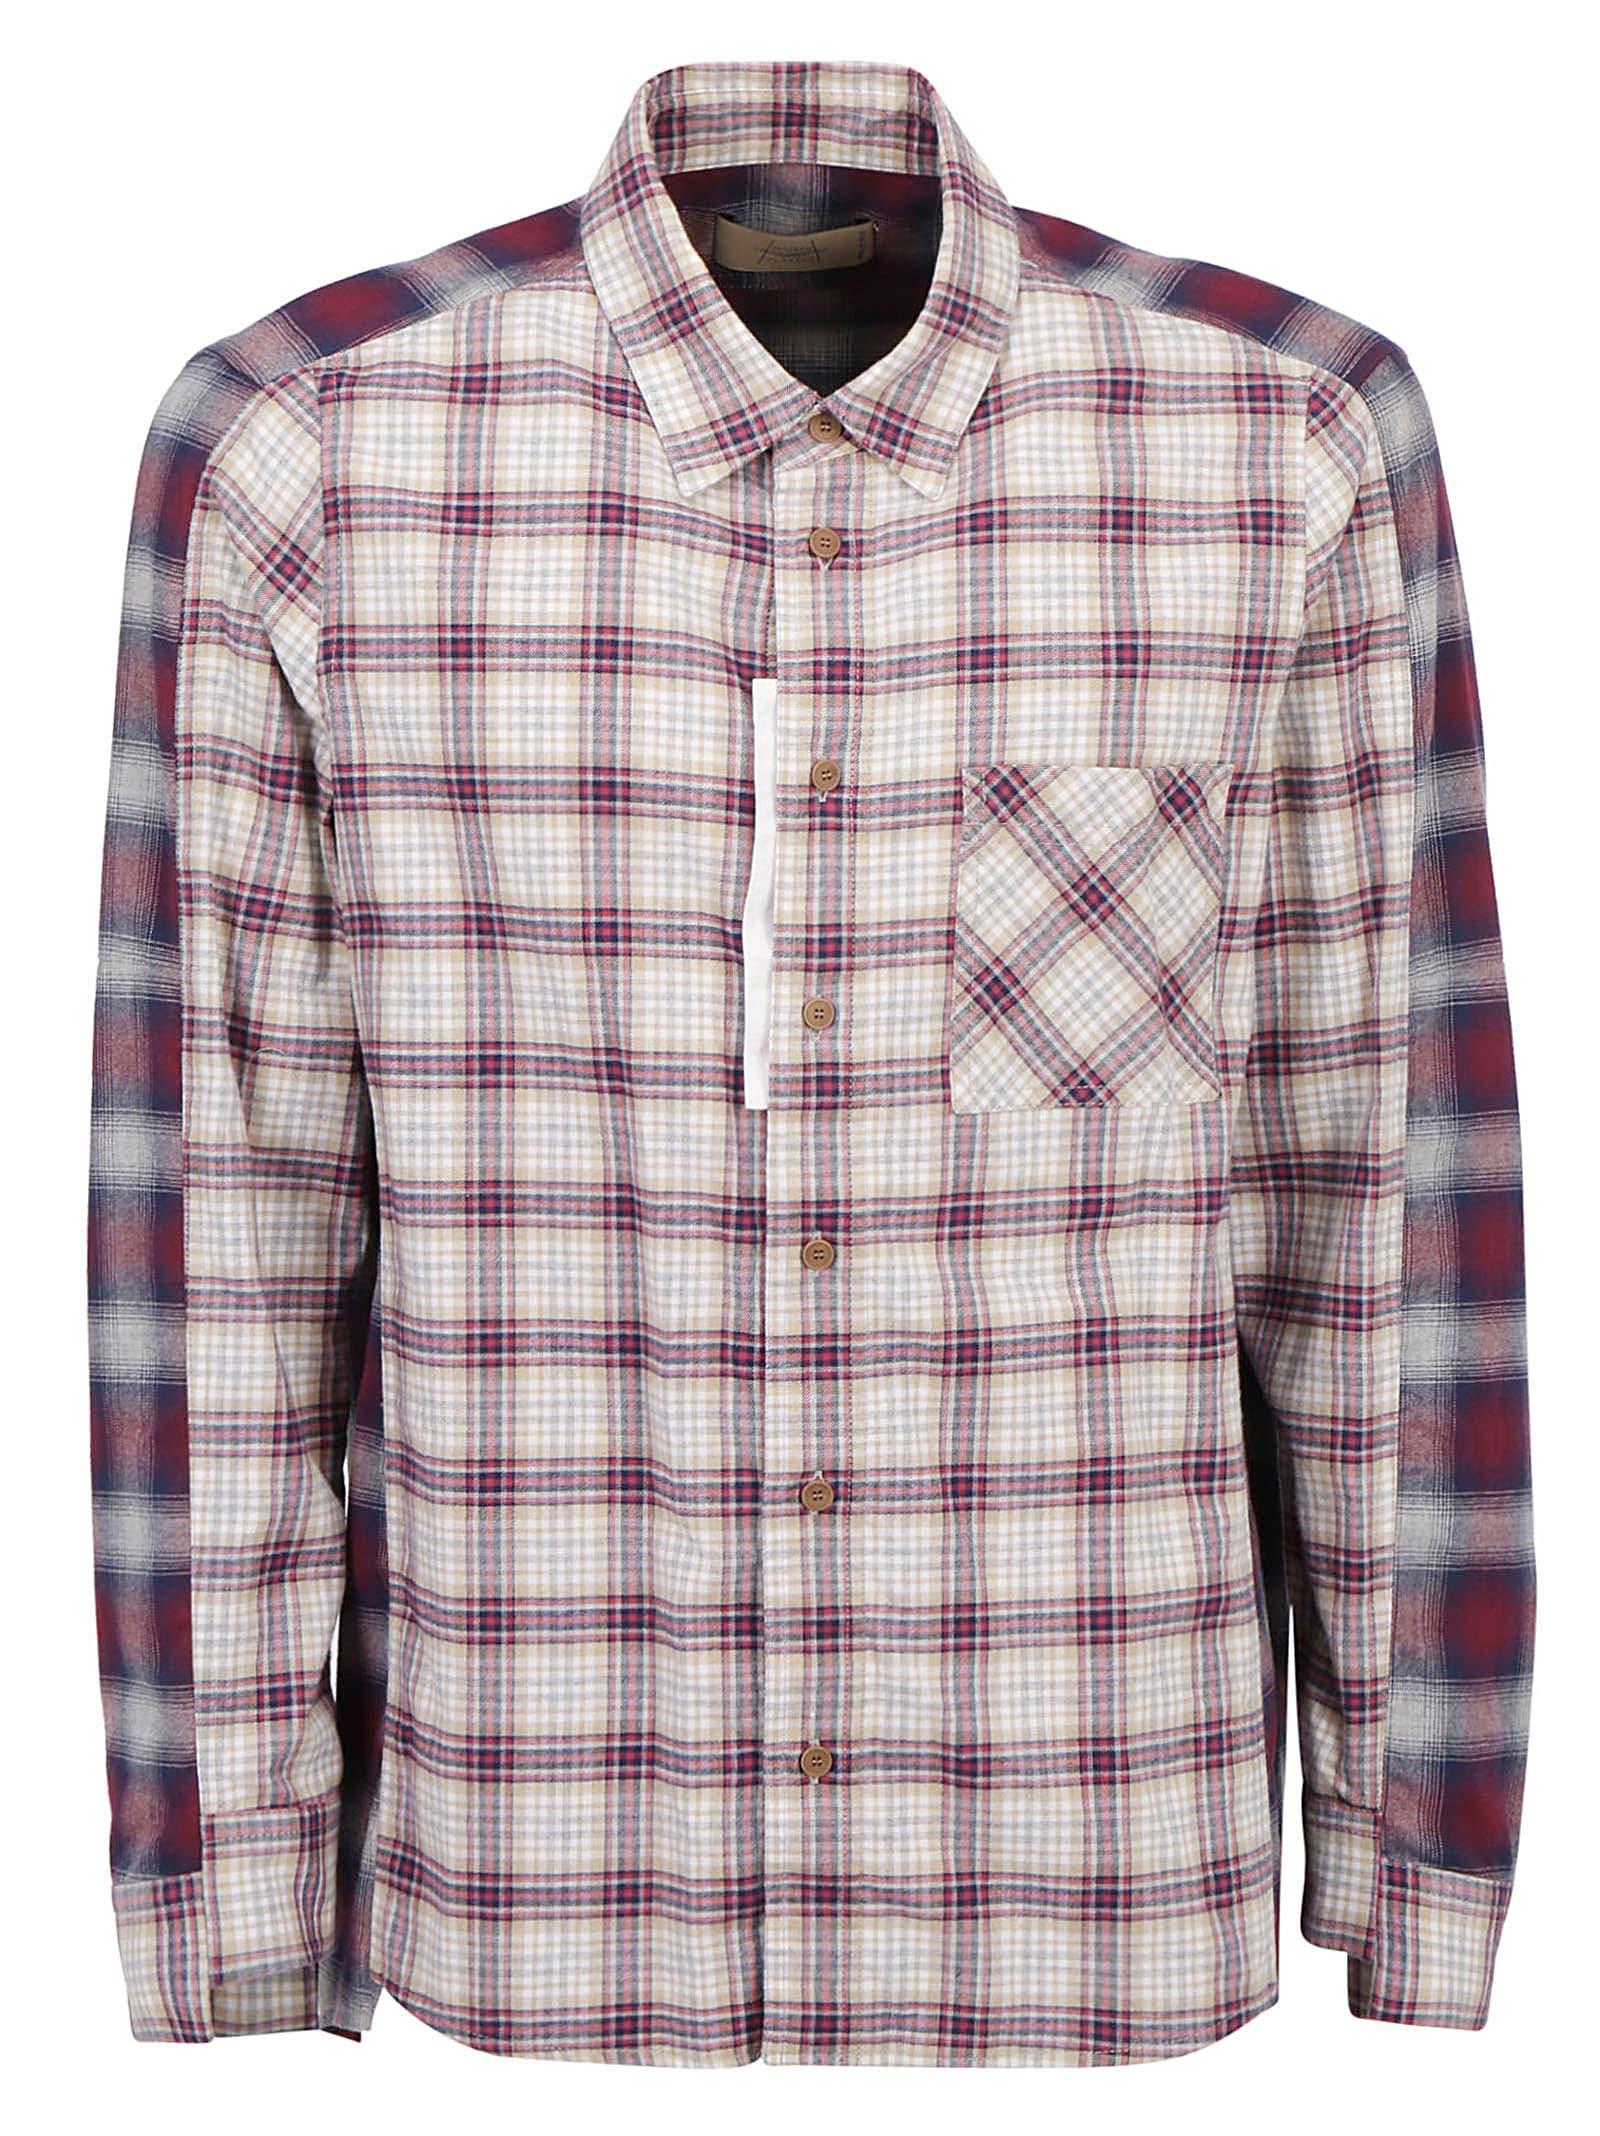 Maison Flaneur Shirt